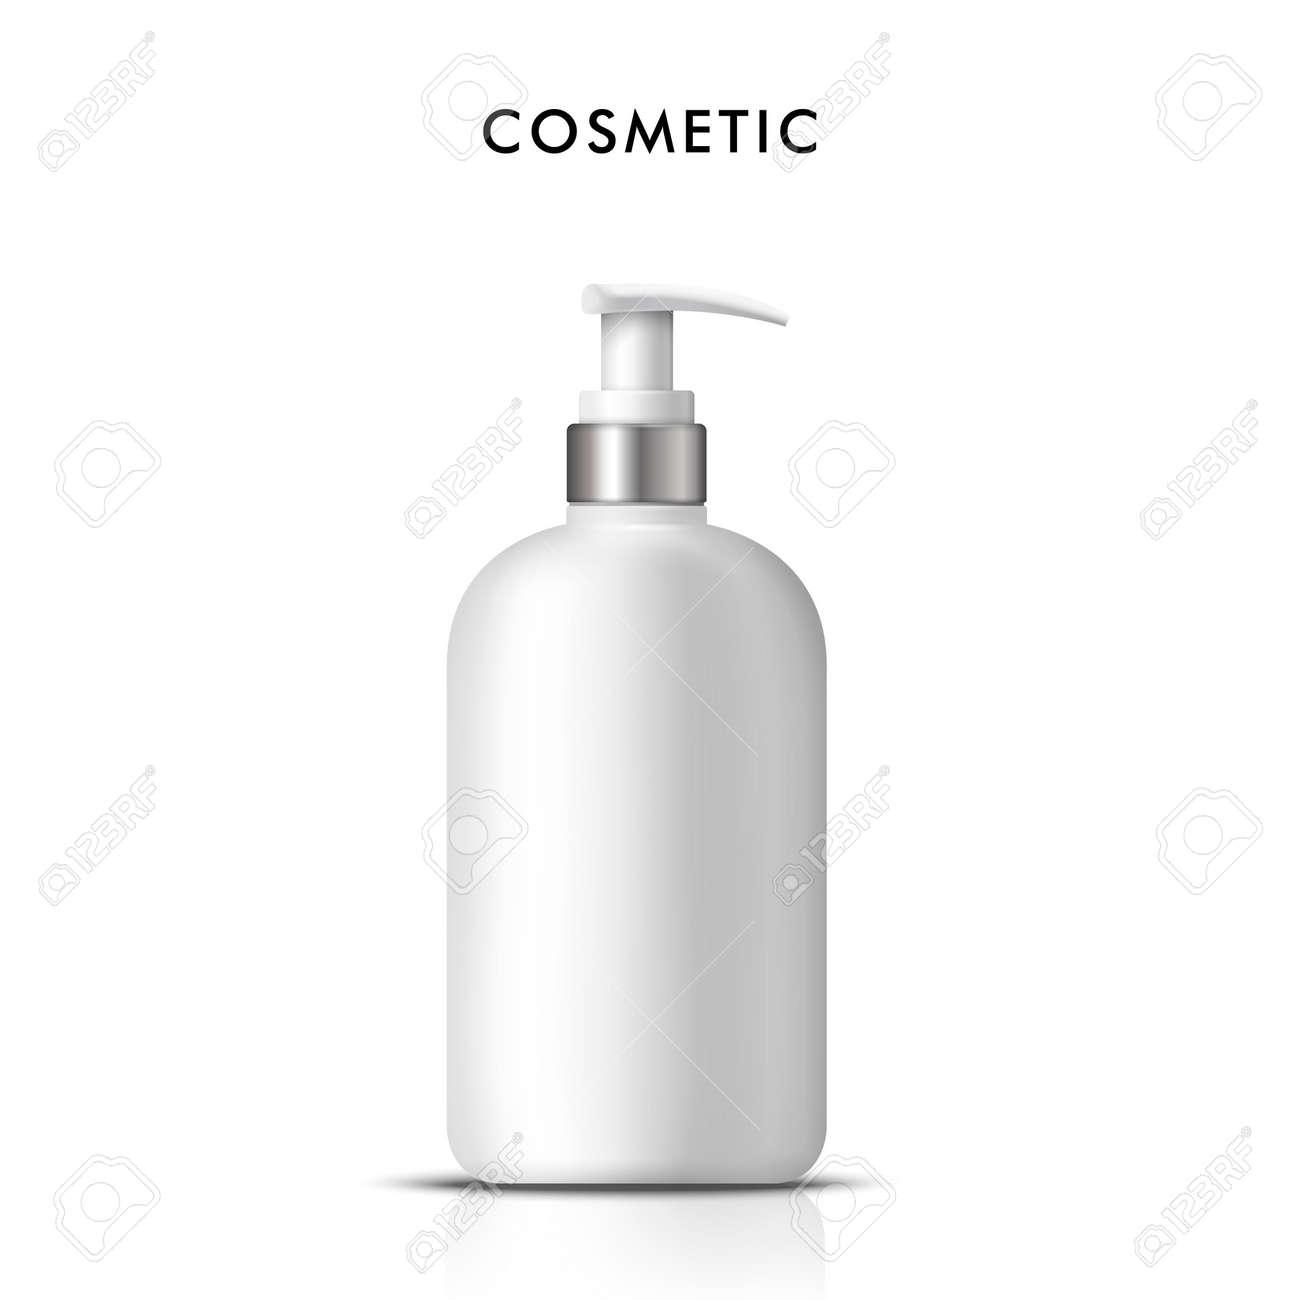 Cosmetic liquid soap bottle,3D illustration realistic plastic